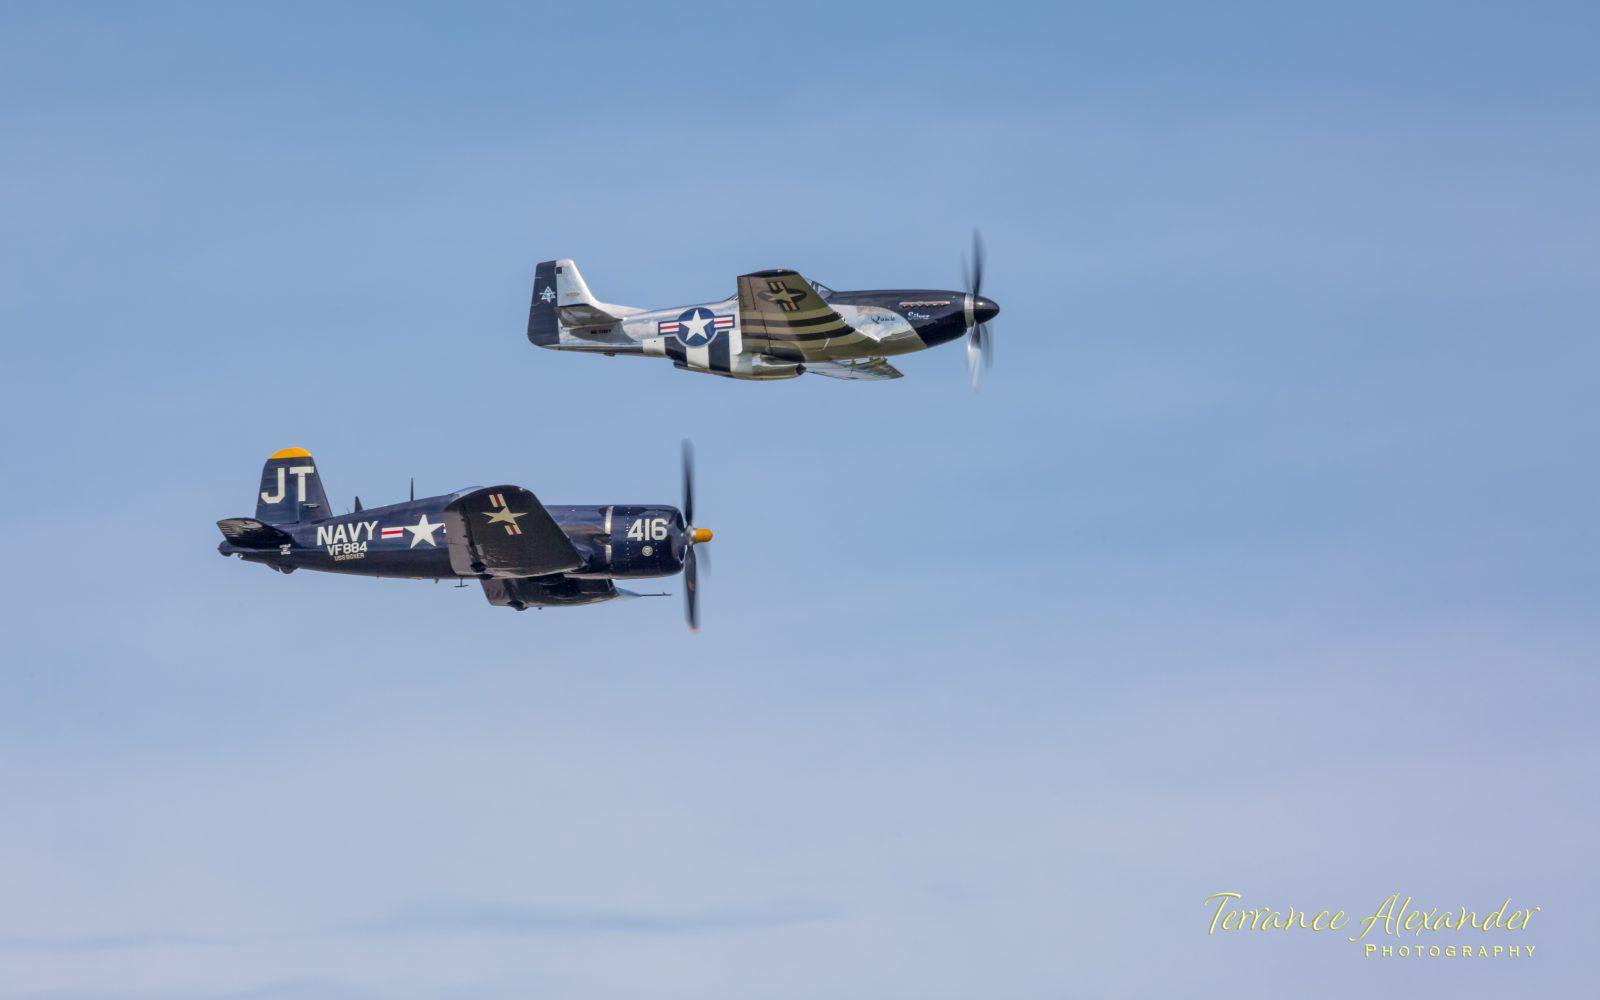 P-51 Mustang and F4U Corsair Formation Flight